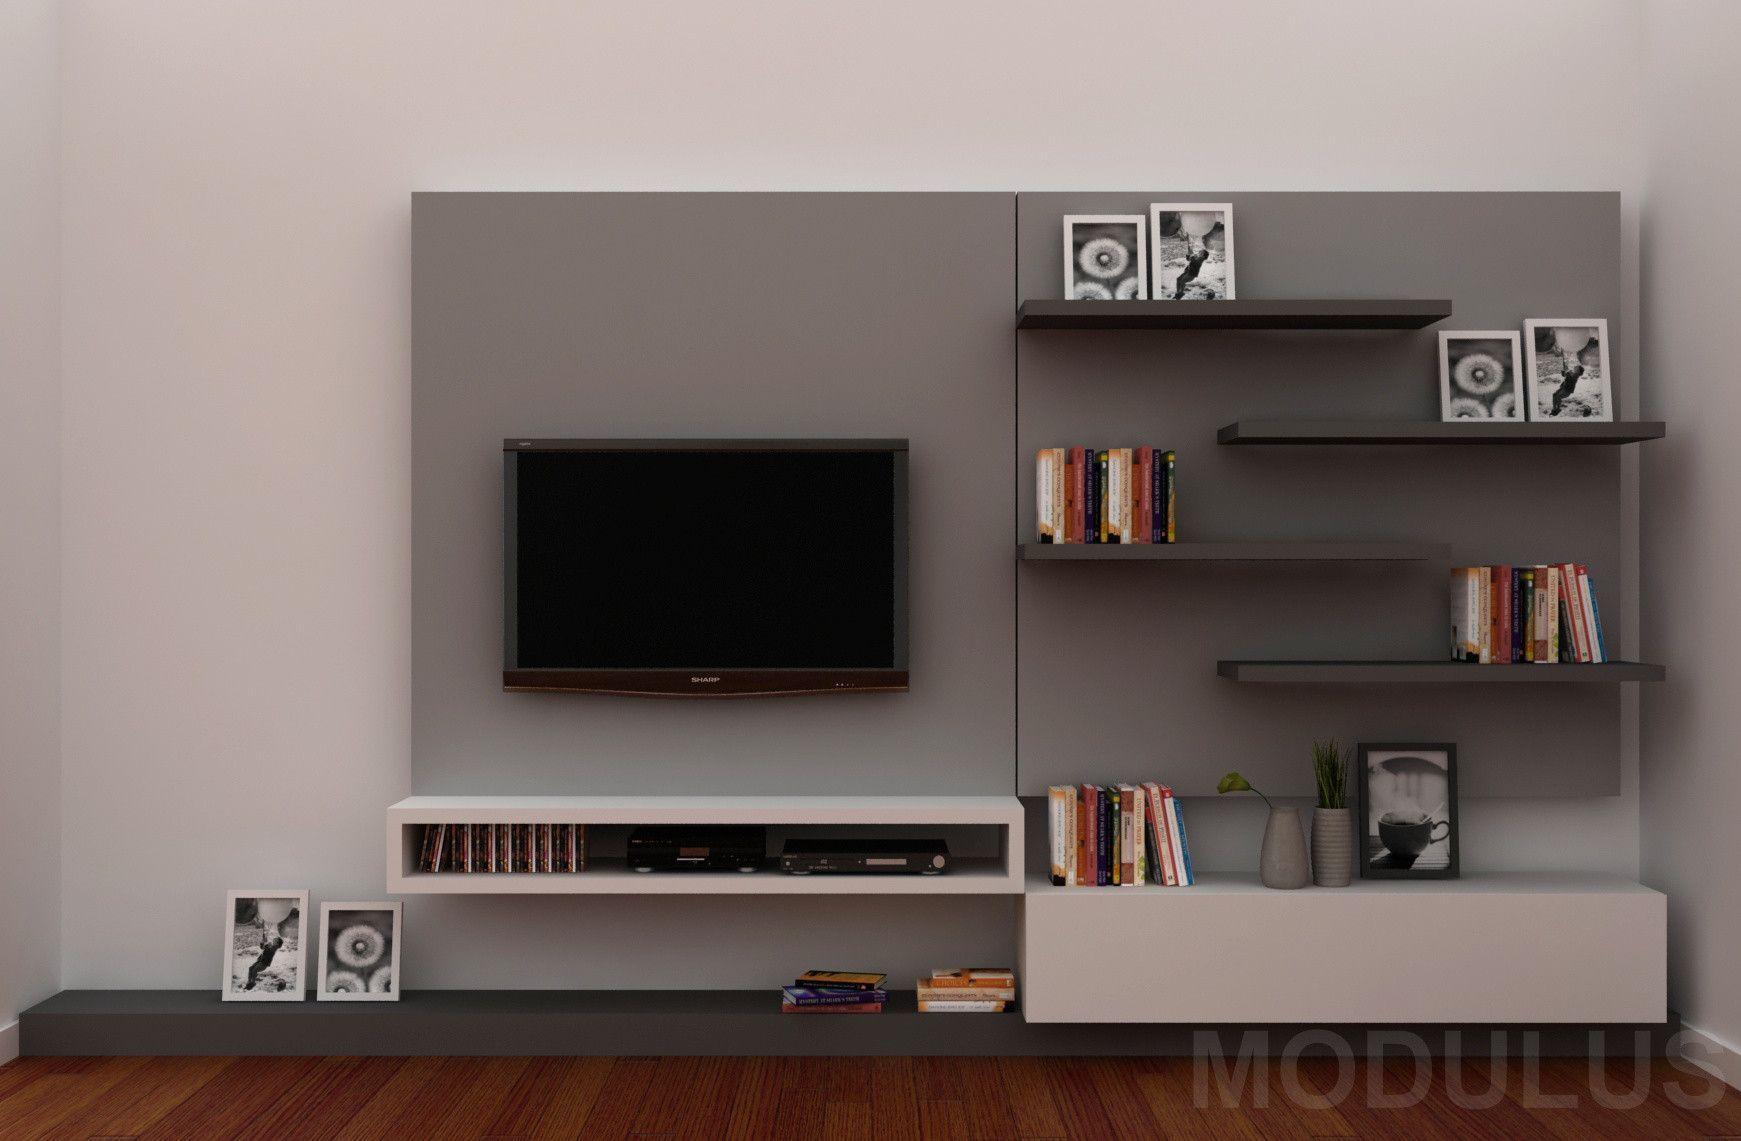 Modulares Para Living Tv Lcd Led Wall Unit Muebles Para Tv Tv In Bedroom Tv Wall Unit Modern Wall Units